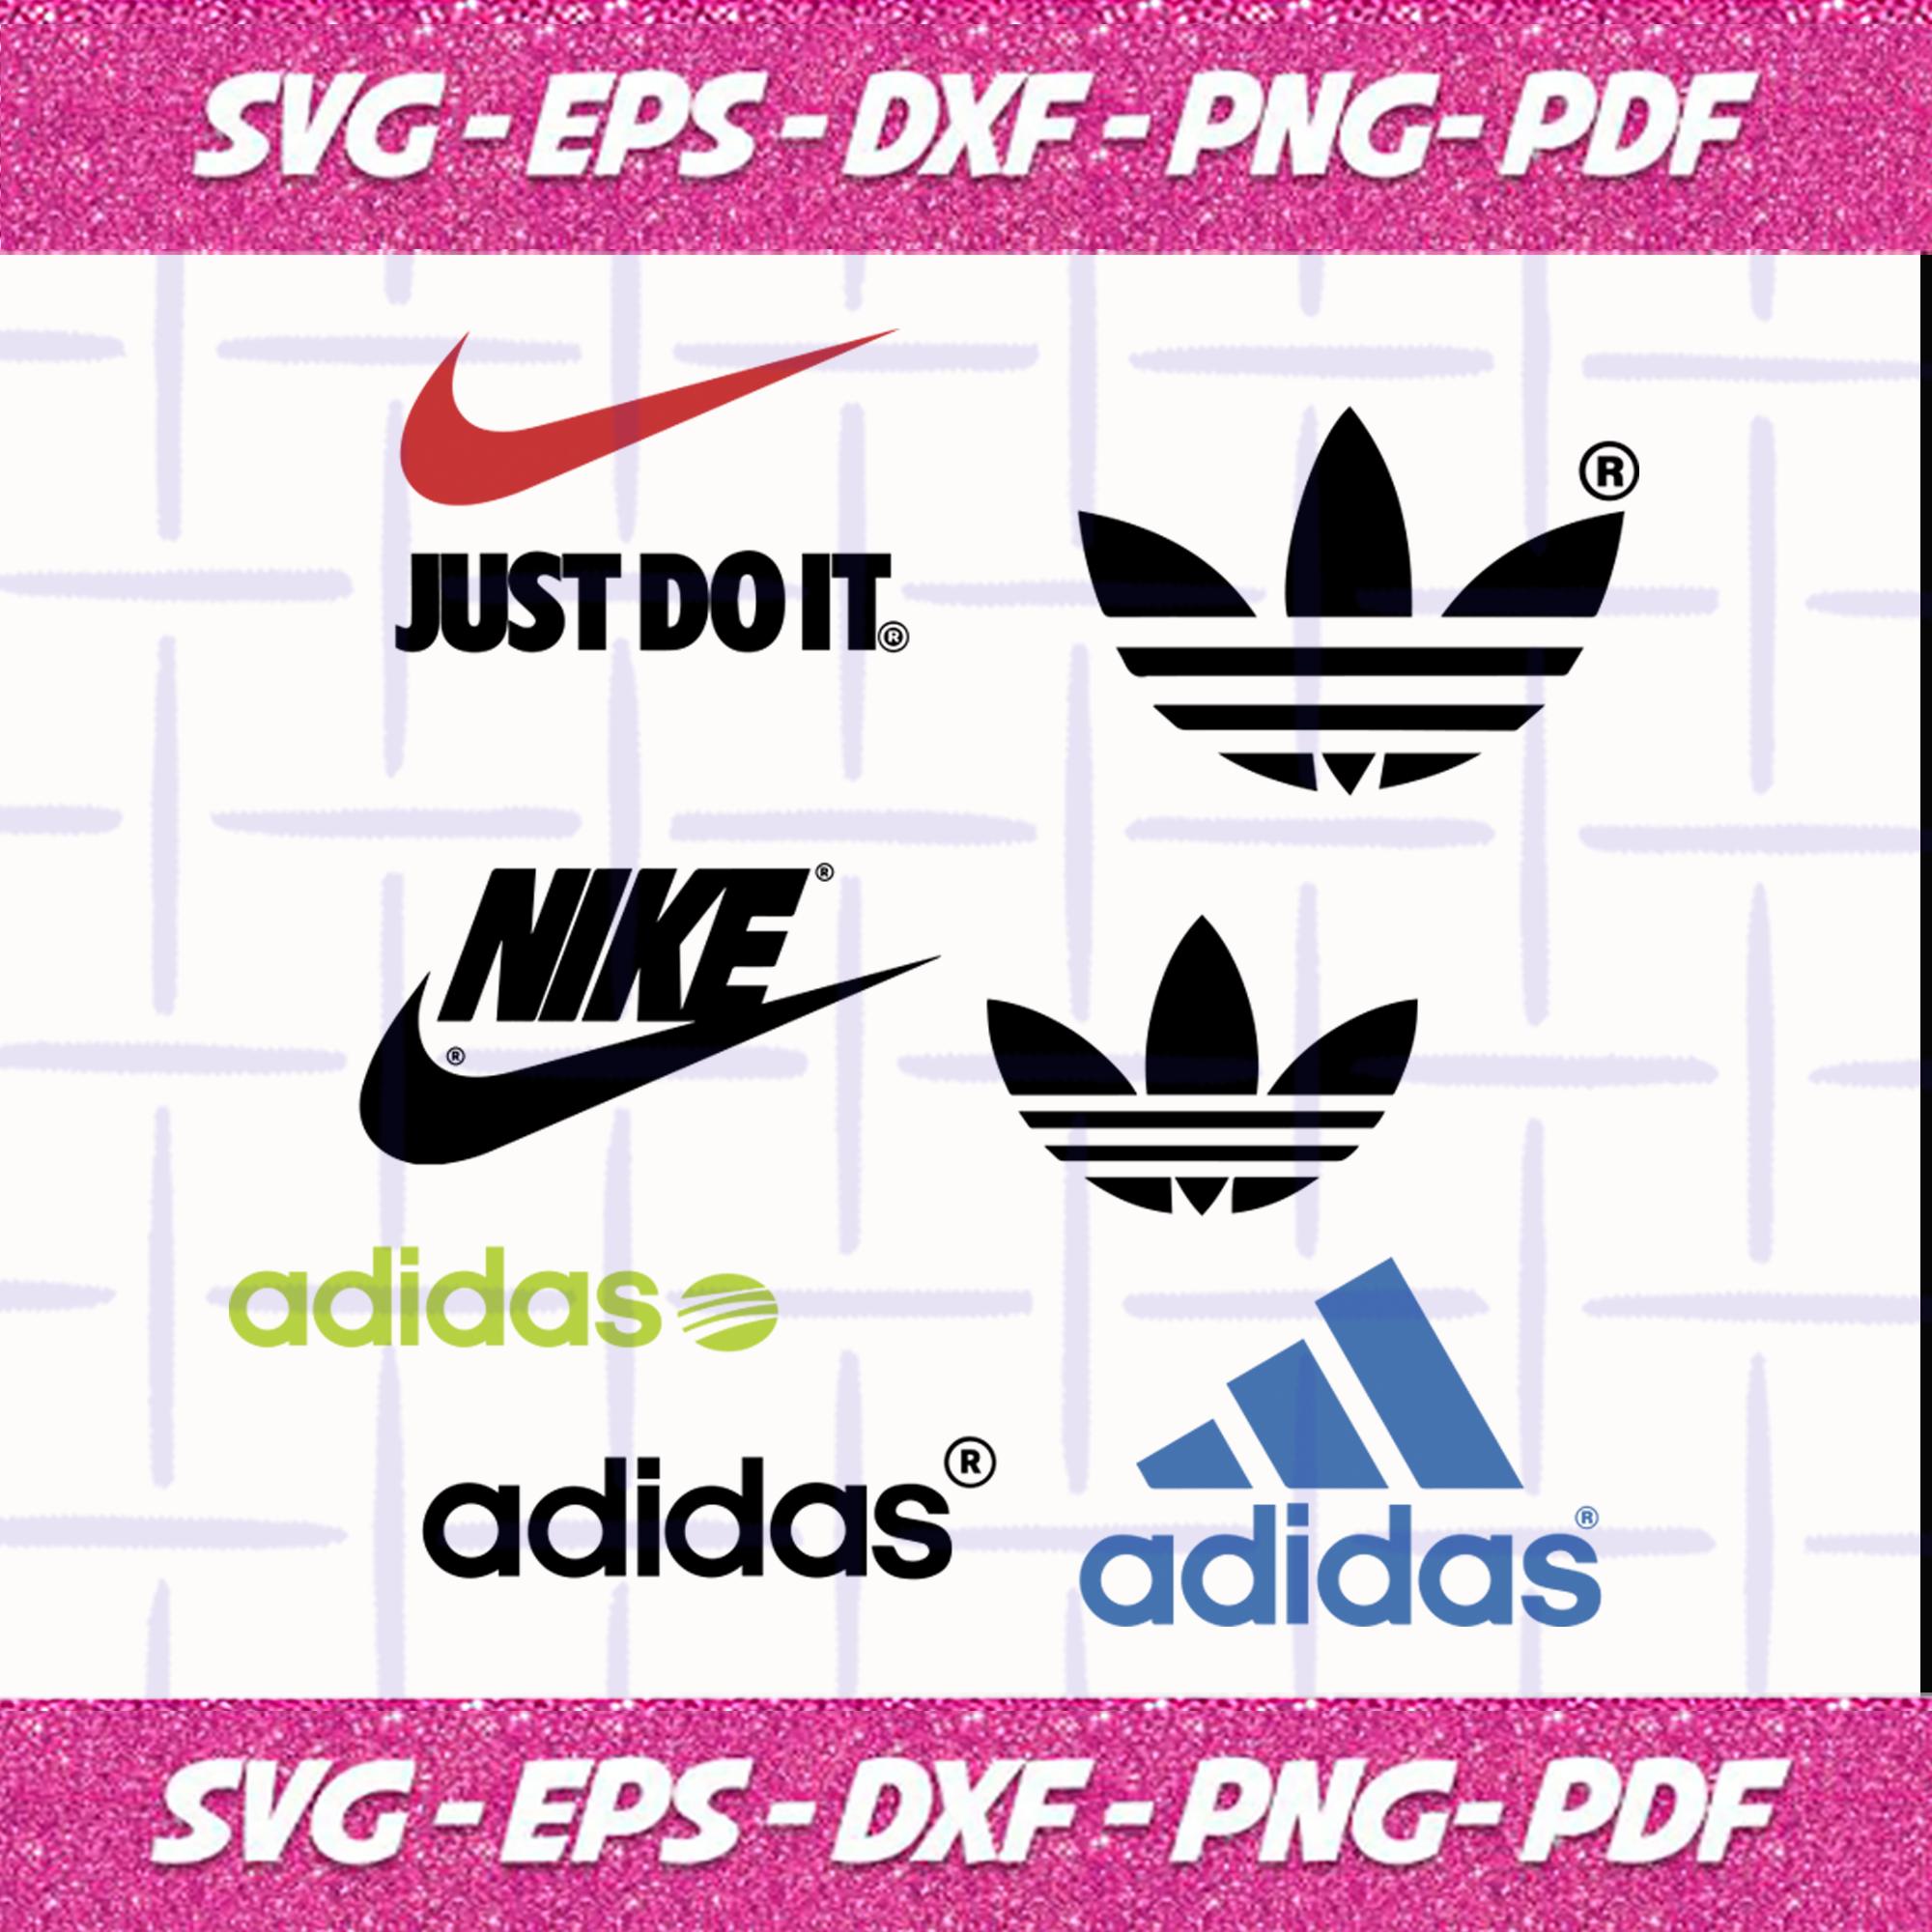 abrazo Mamá Mus  Adidas, adidas svg, vintage adidas, adidas vintage, adidas shirt, adidas t  shirt, adidas logo, adida | Svg, Nike logo, Cricut svg files free